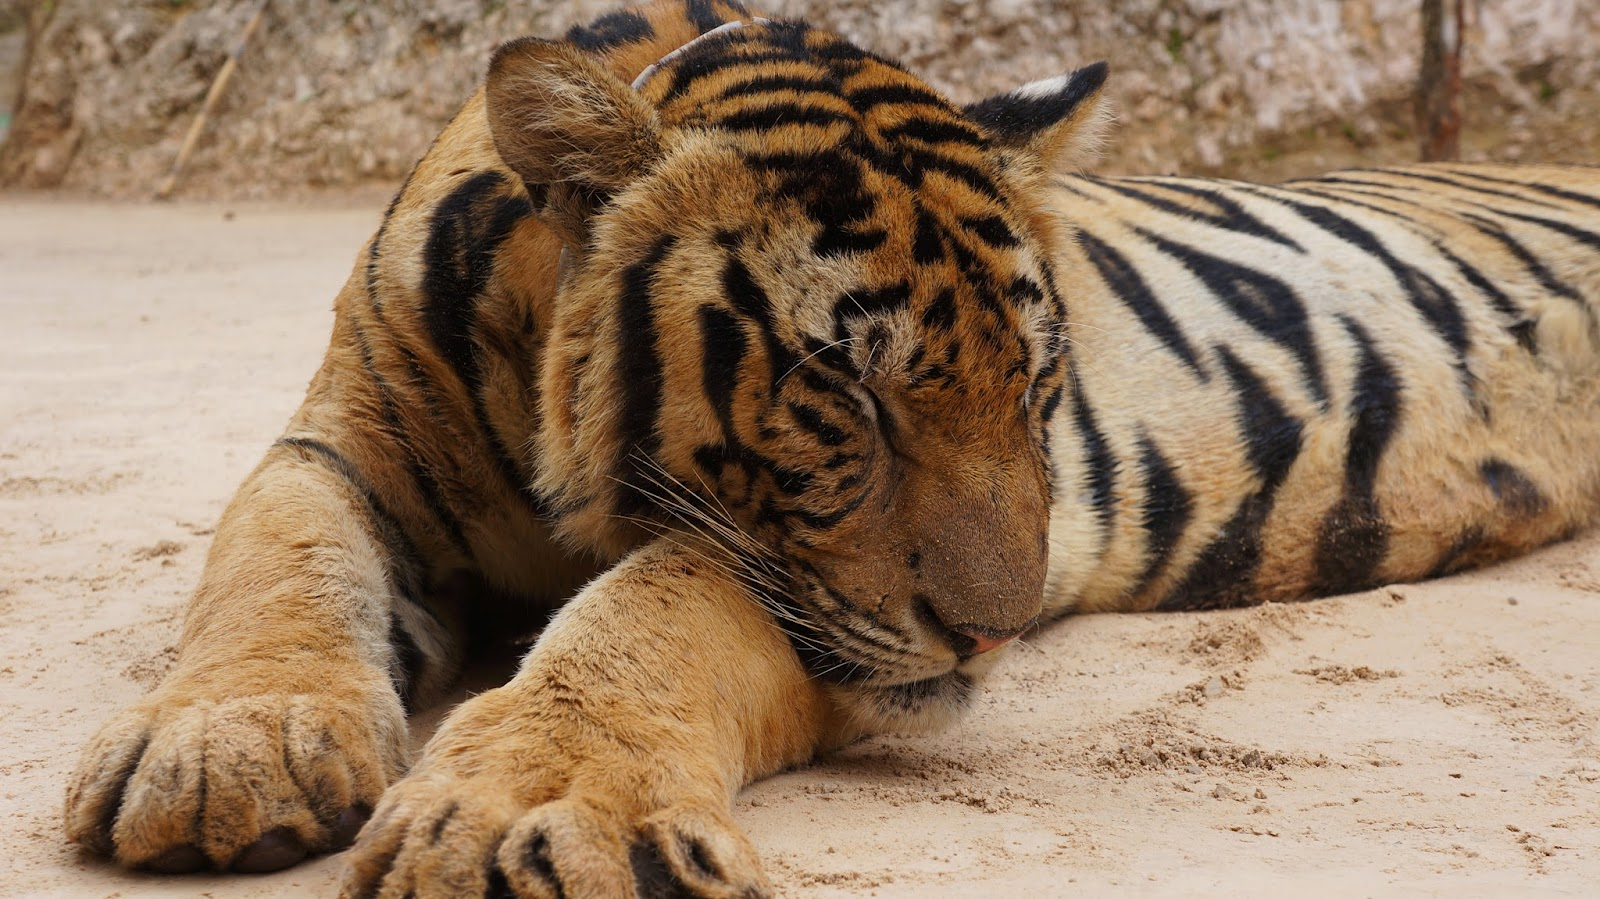 Just a tiger taking a nap in Tiger Temple, Kanchanaburi